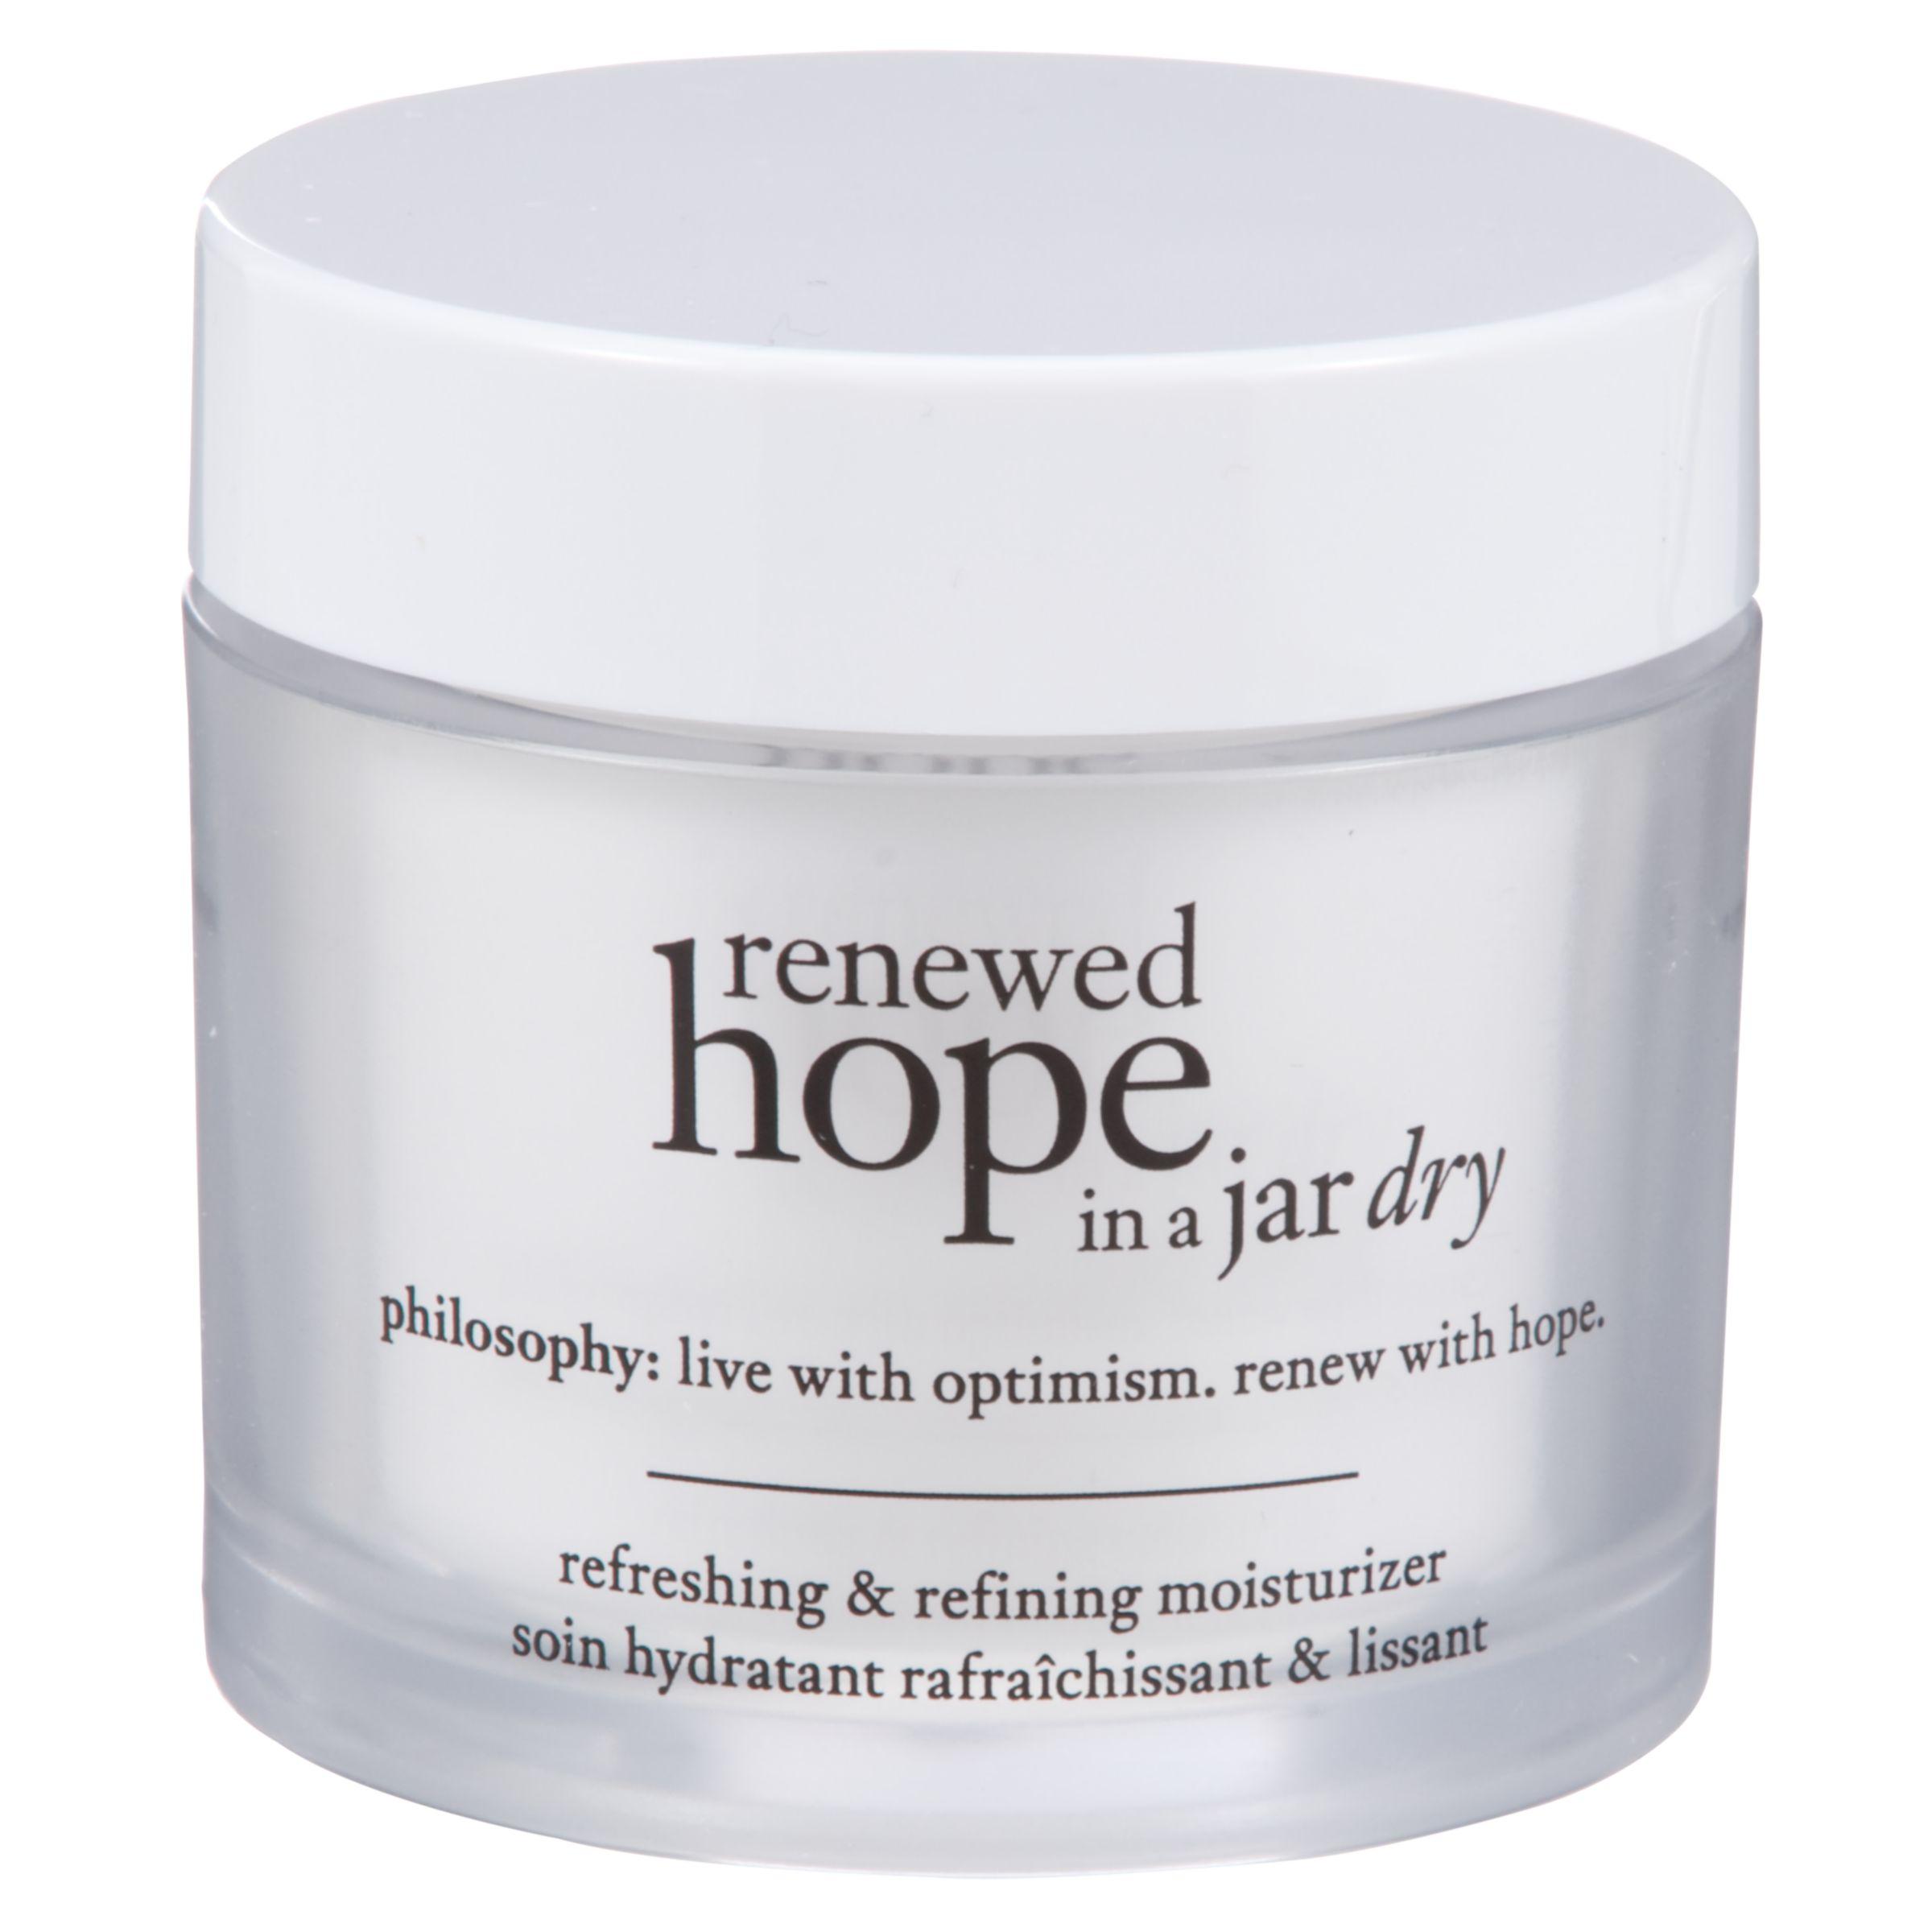 Philosophy Philosophy Renewed Hope in a Jar Dry Skin Moisturiser, 60ml